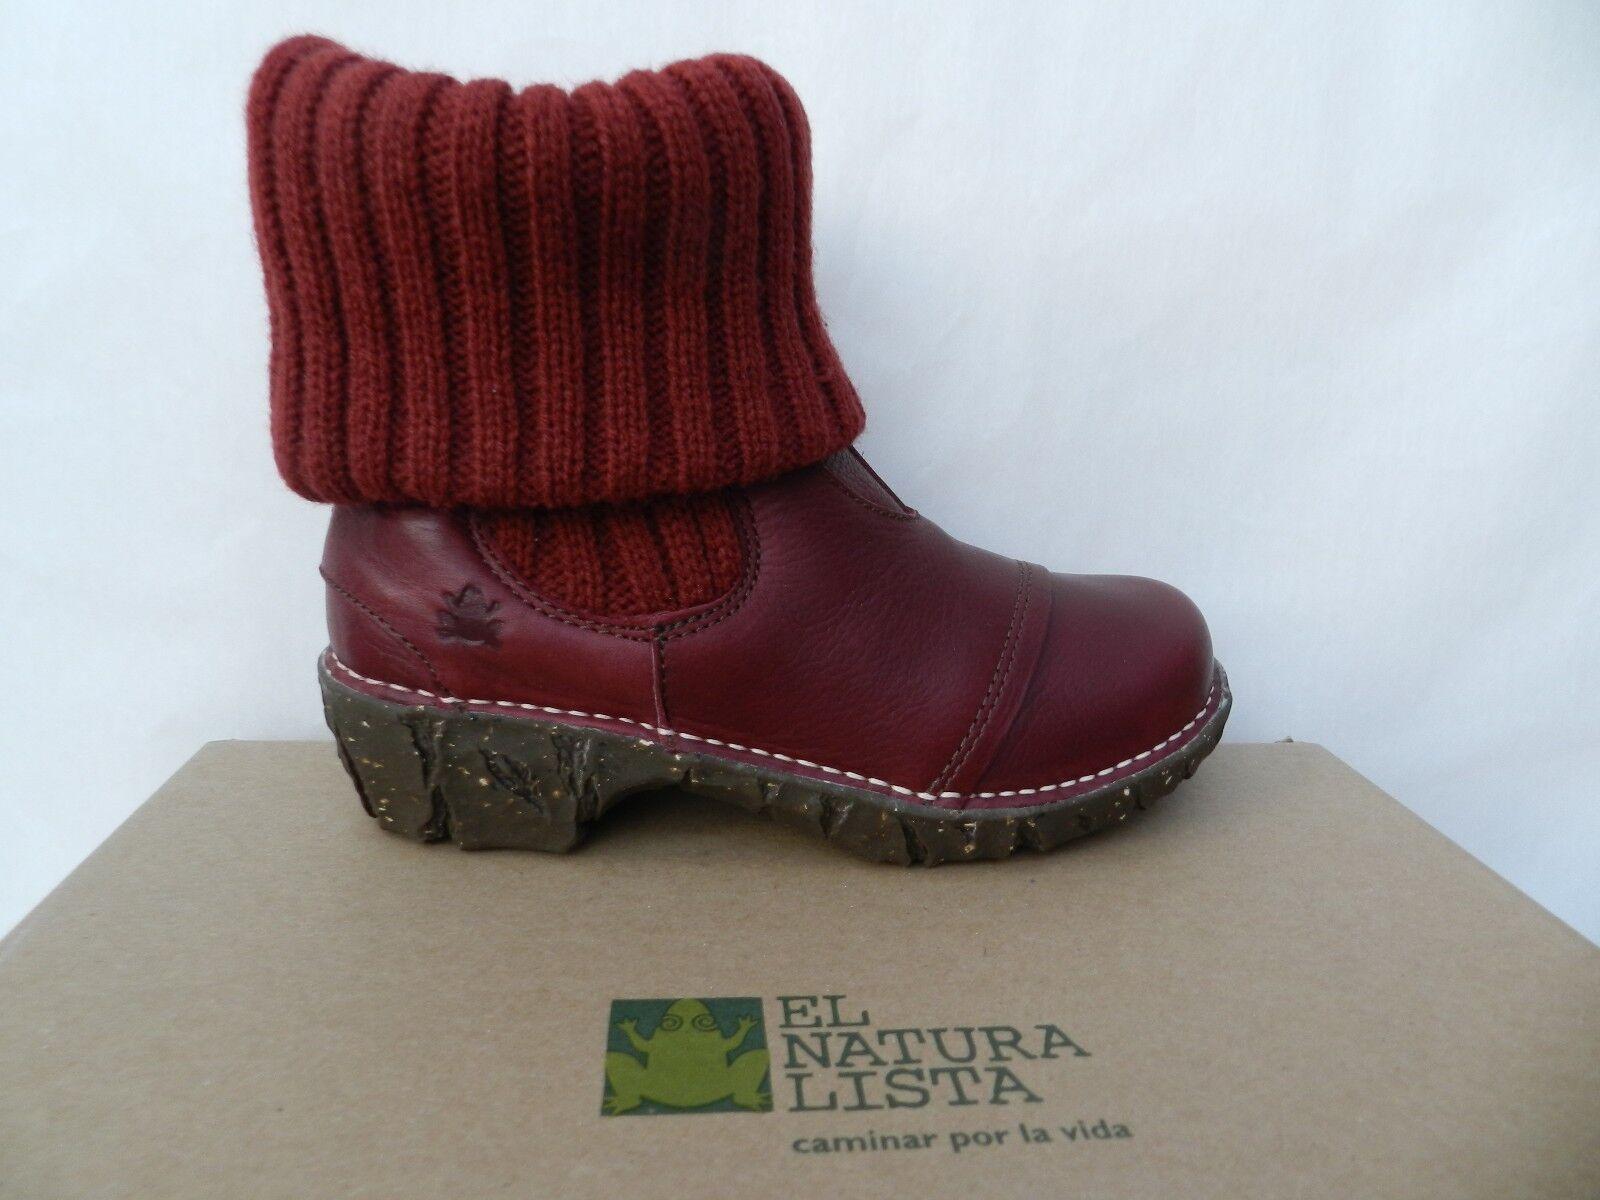 El Naturalista Yggdrasil 097 shoes Femme 36 Iggdrasil N097 Rioja UK3 Neuf